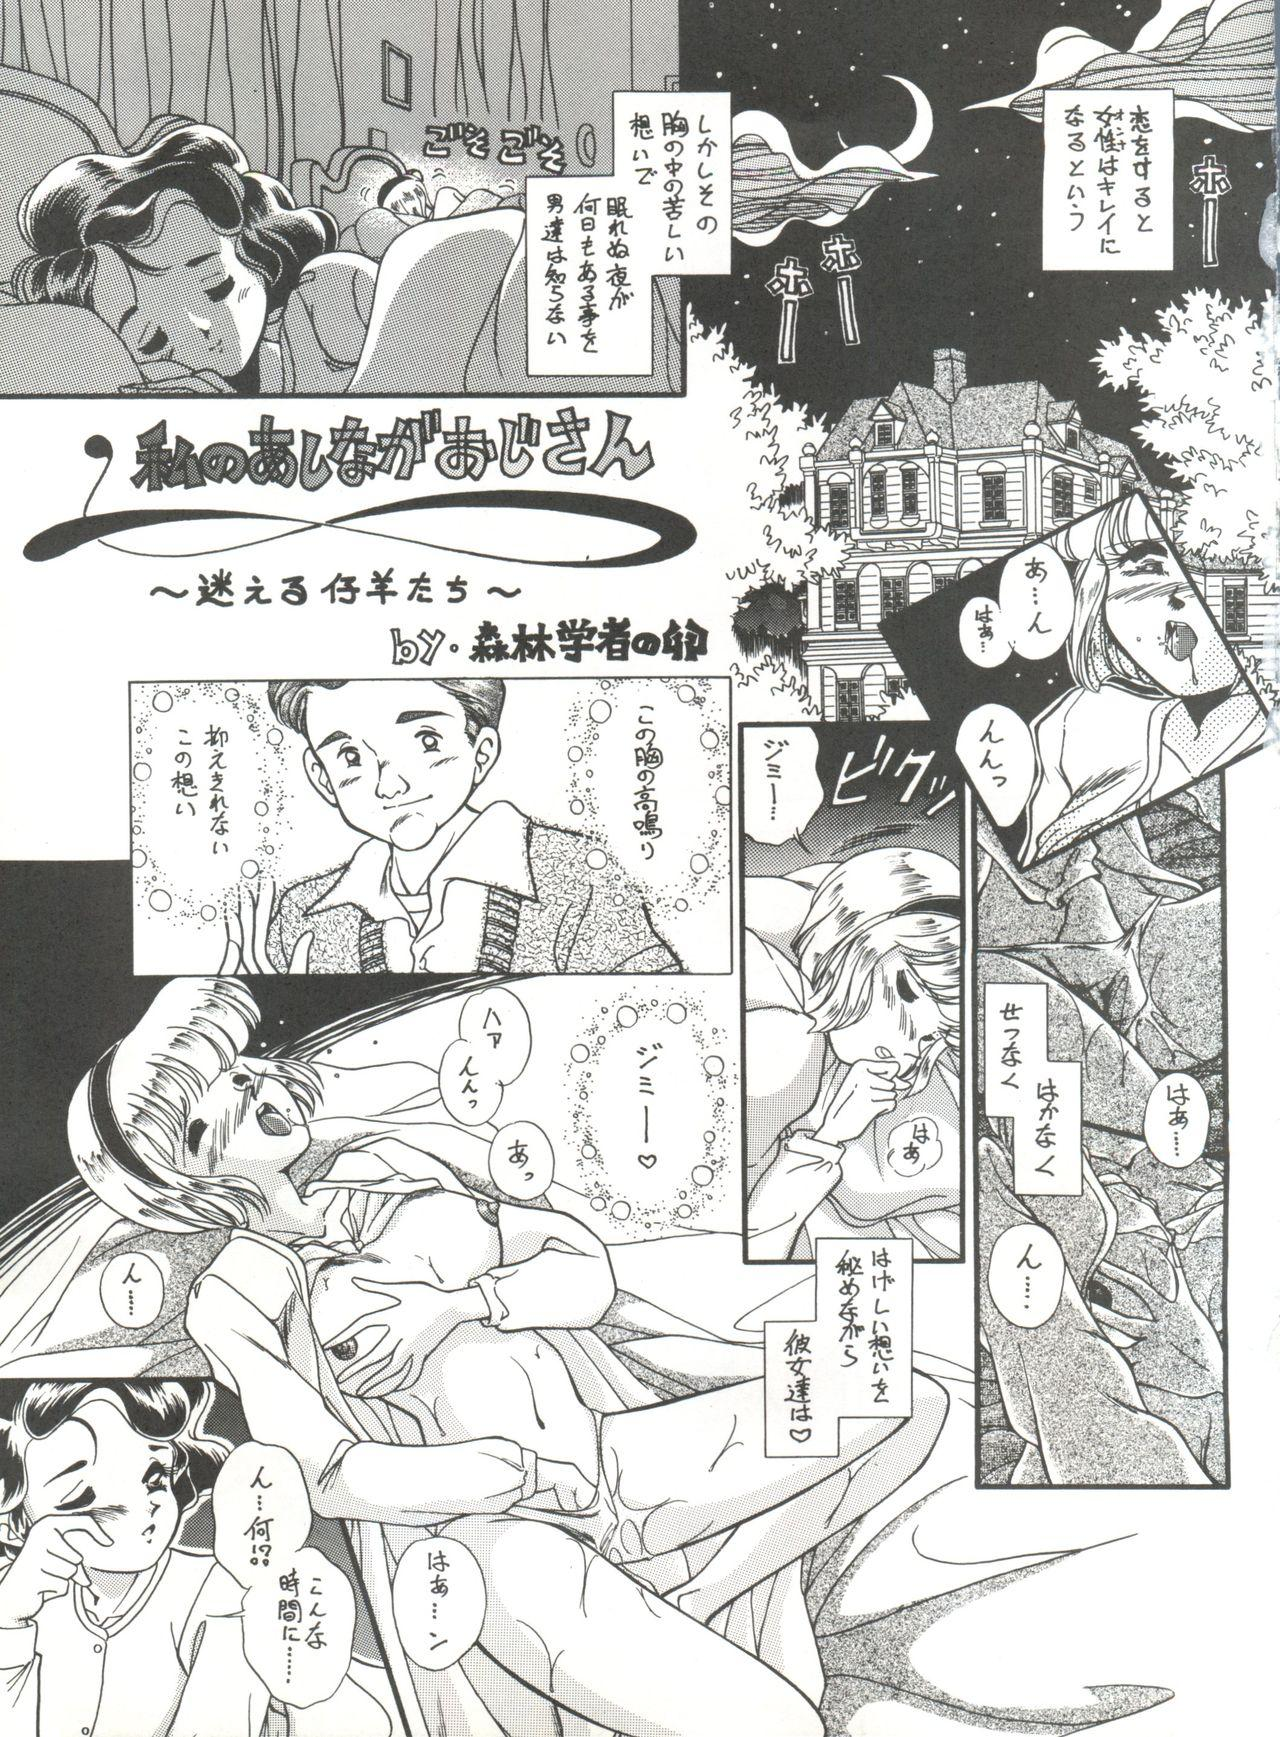 Hara Hara Dokei Vol. 4 Quattro 57